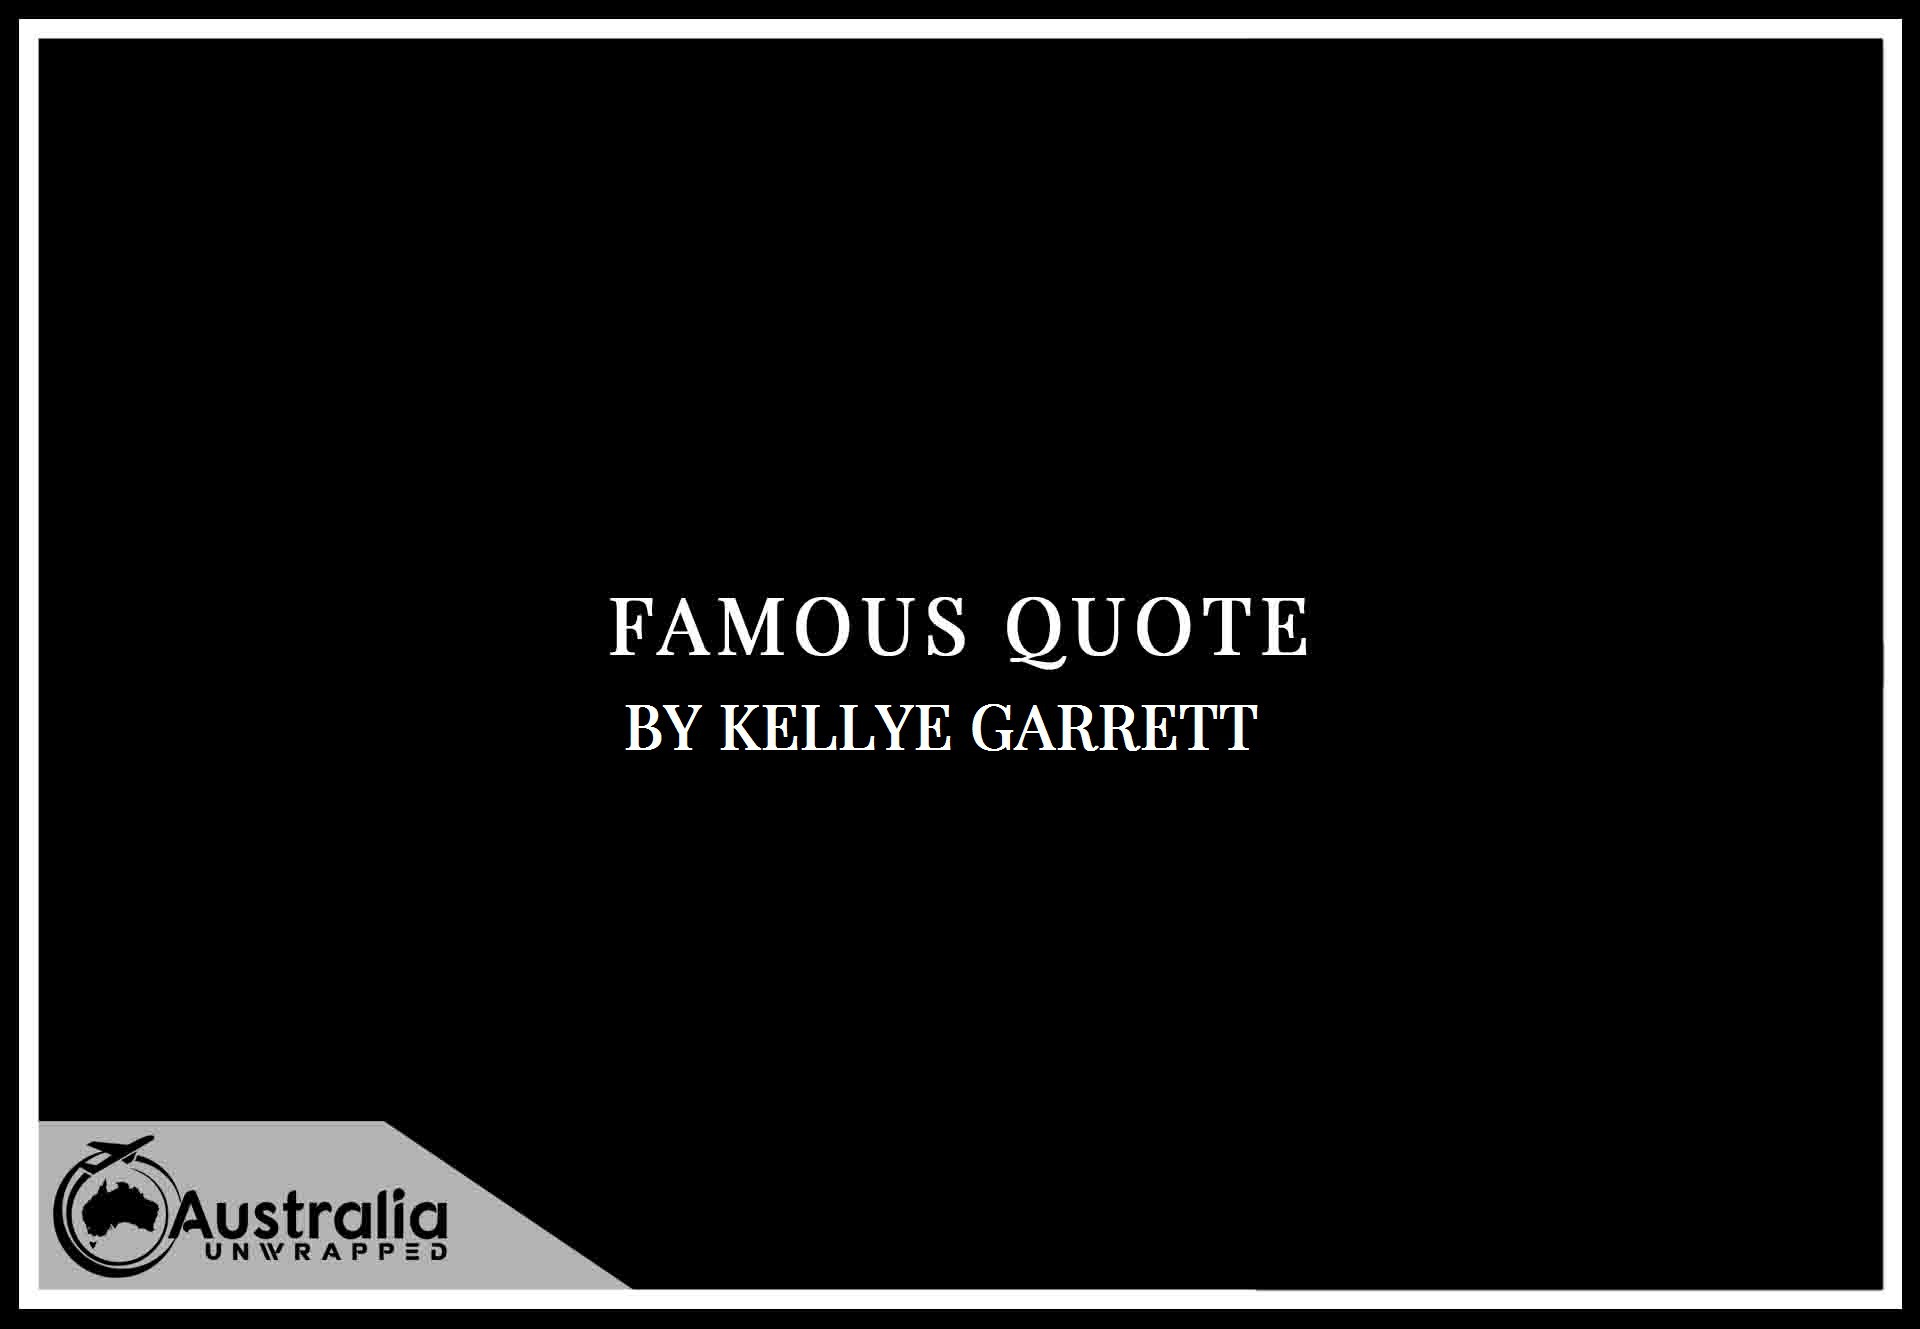 Kellye Garrett's Top 1 Popular and Famous Quotes